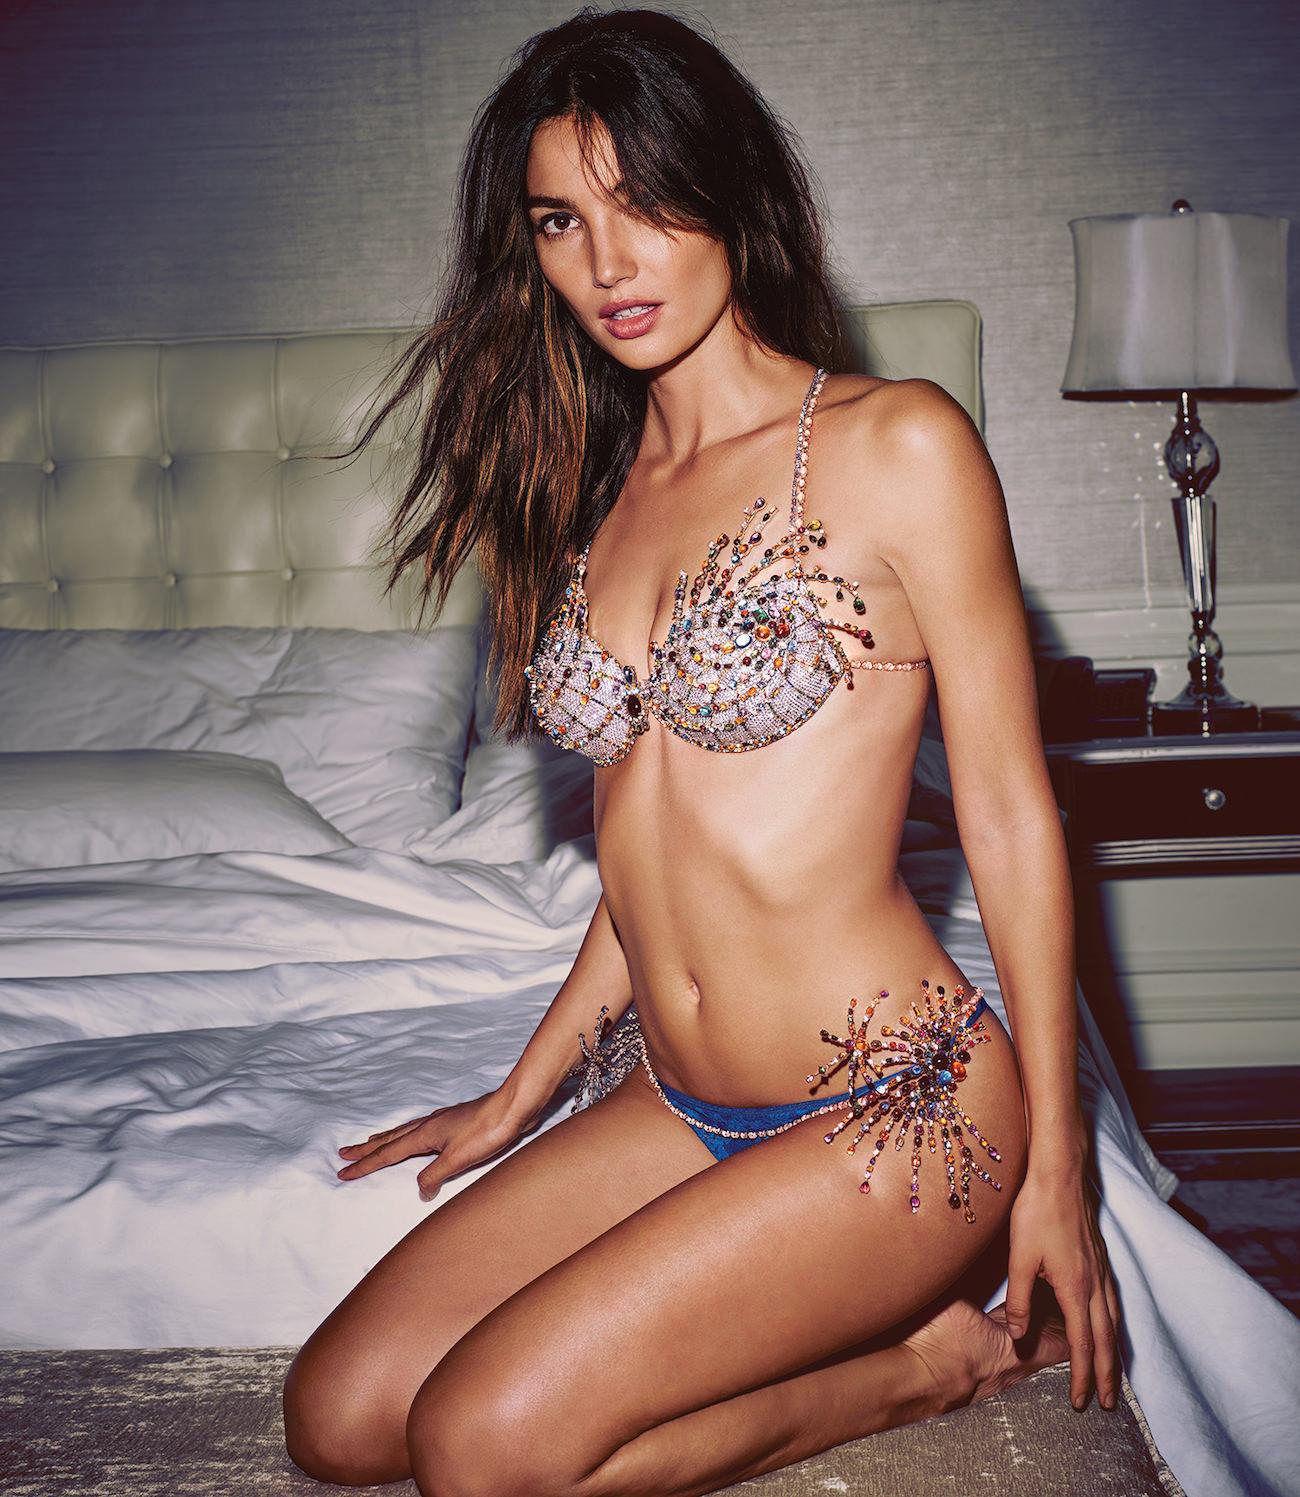 c311d045db402 Fireworks Fantasy Bra by Victoria s Secret  the most expensive bra ...